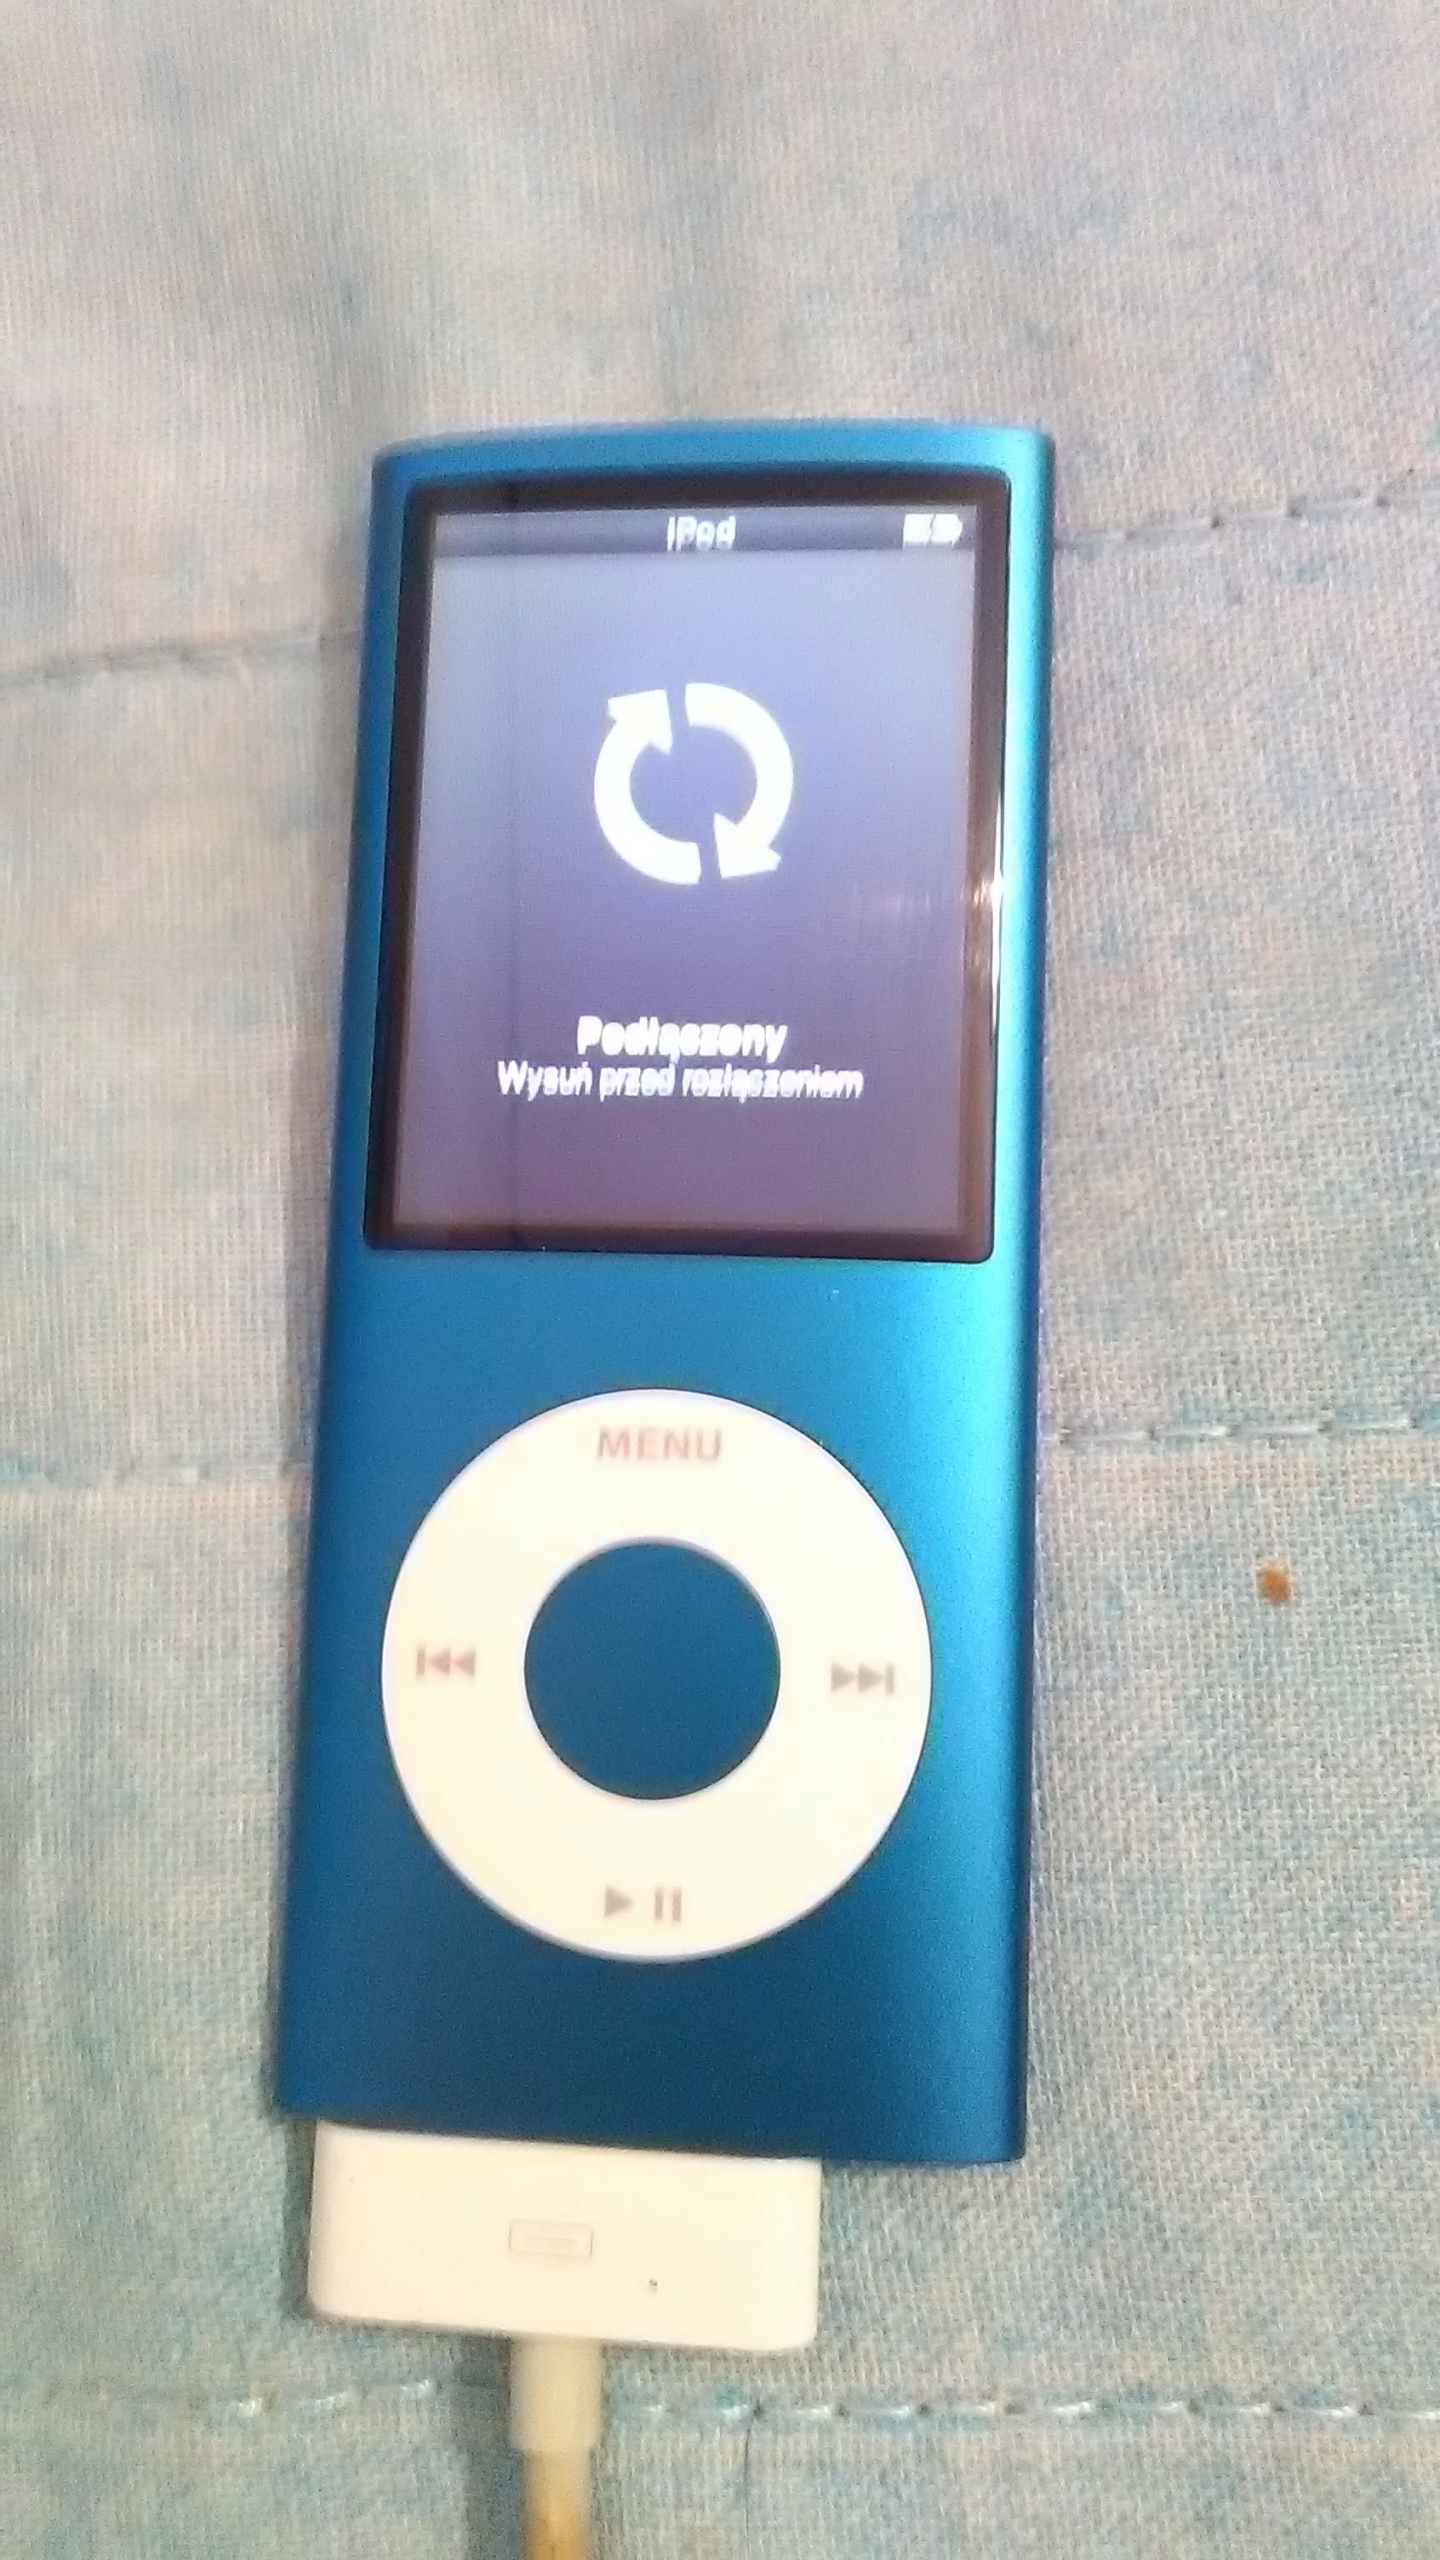 Apple iPod Nano 4G 8GB